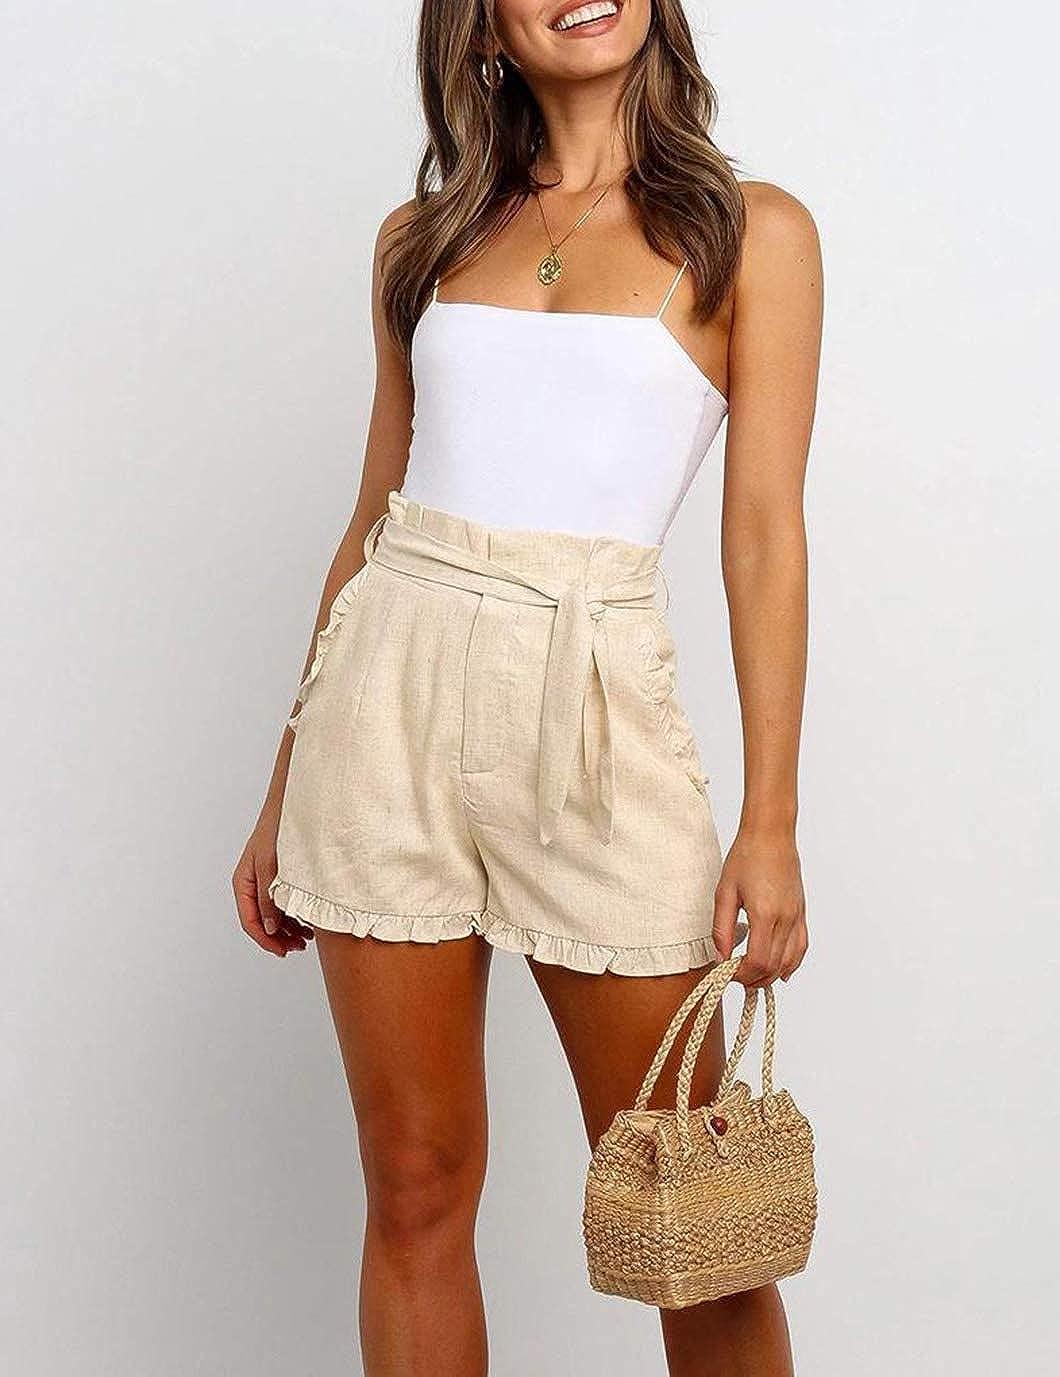 Eddoyee Womens Casual Elastic Shorts Ruffle Trim High Waist Lounge Pant Summer Vacation